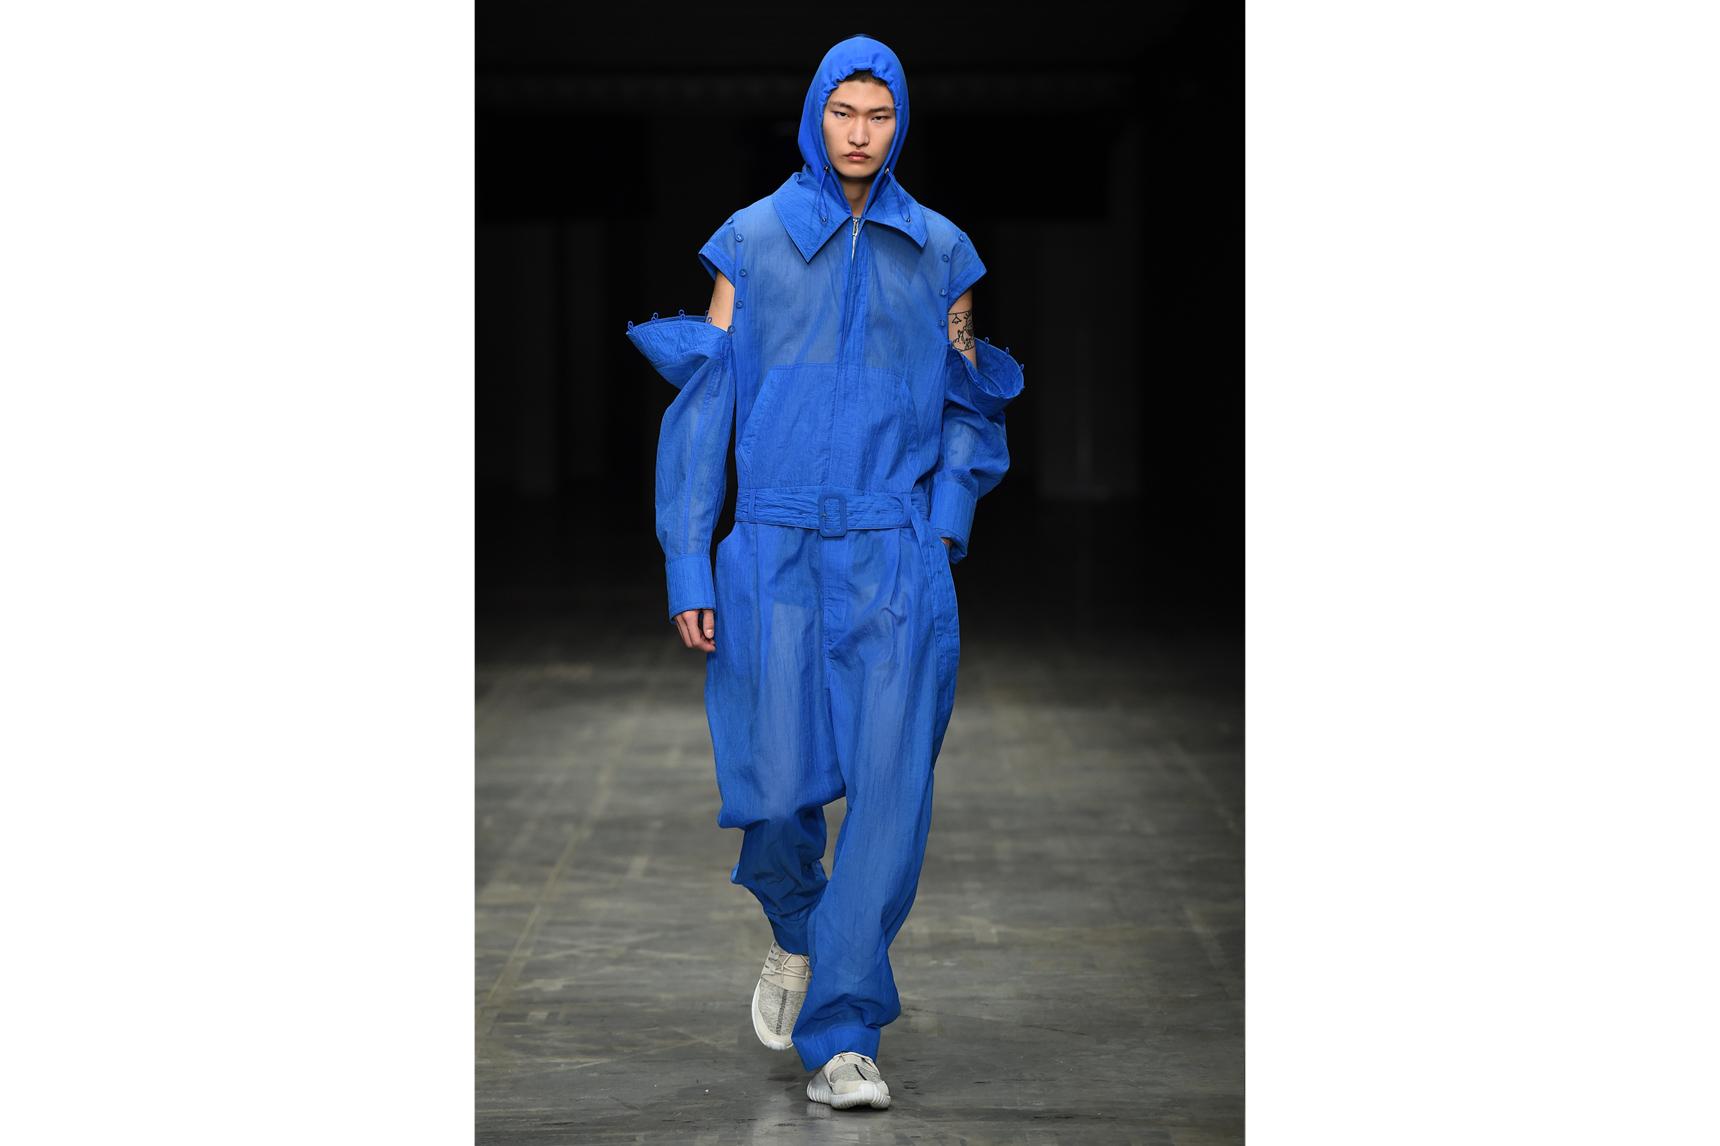 Angel Chen milano fashion show look 5-Edit.jpg